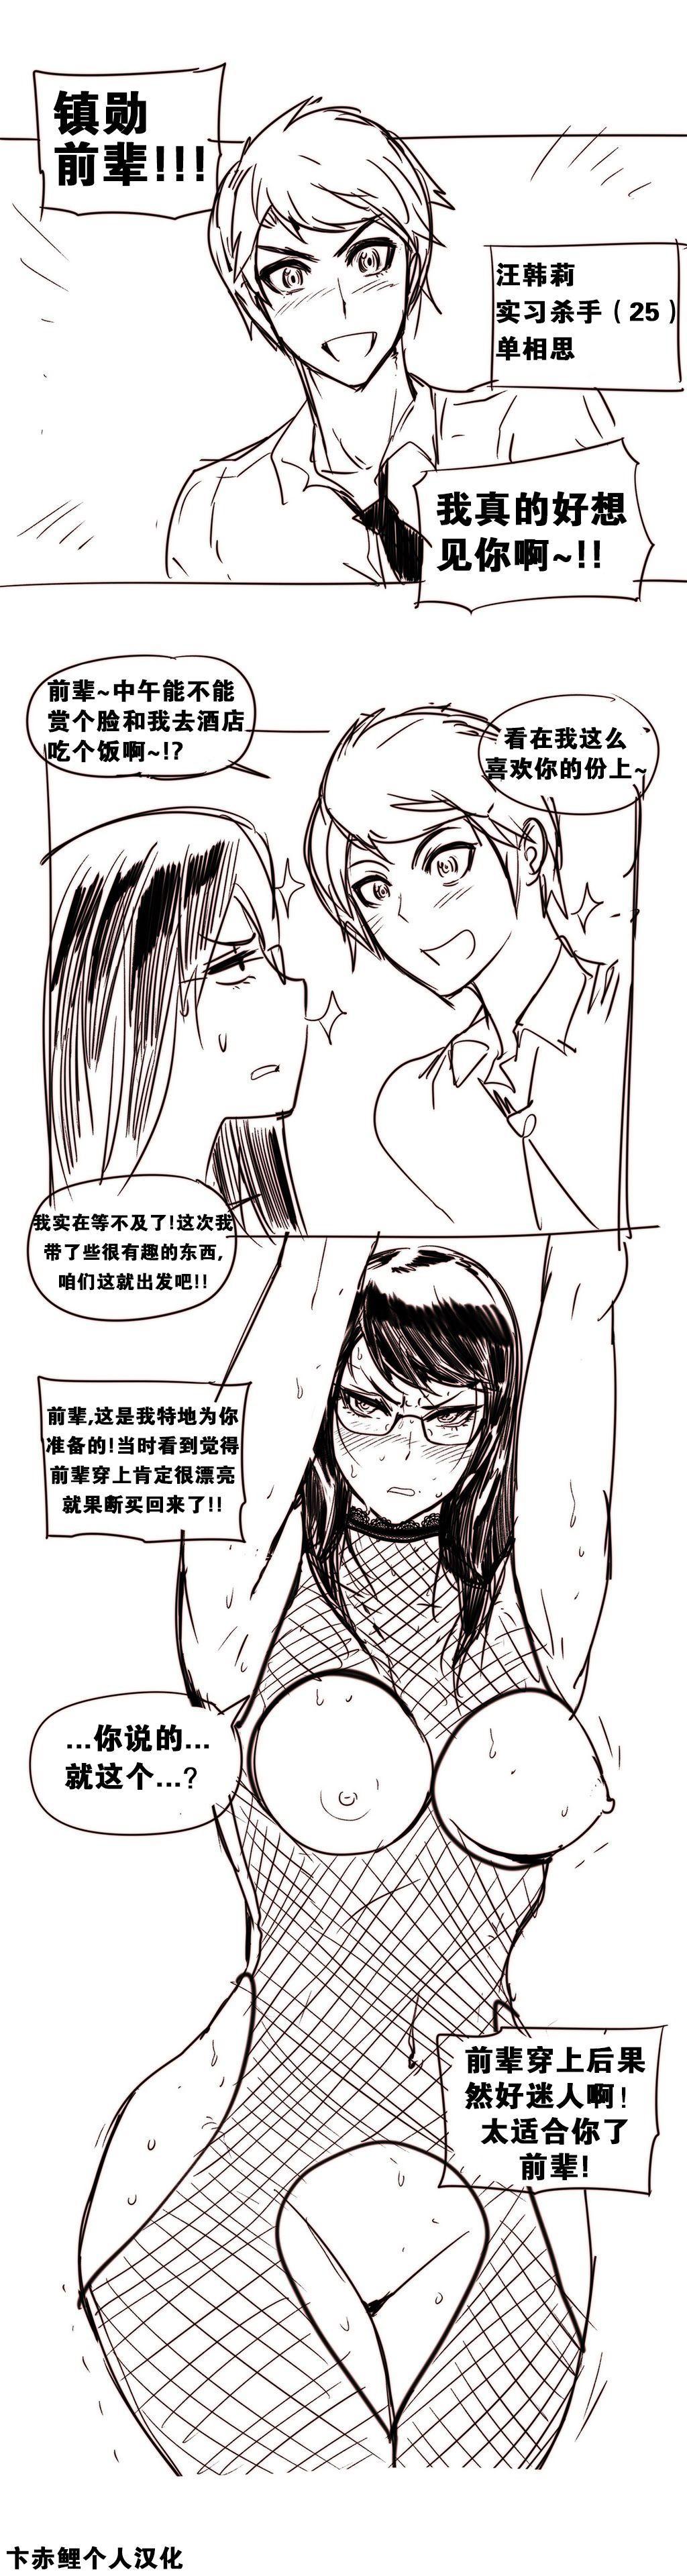 HouseHold Affairs 【卞赤鲤个人汉化】1~21话(持续更新中) 277